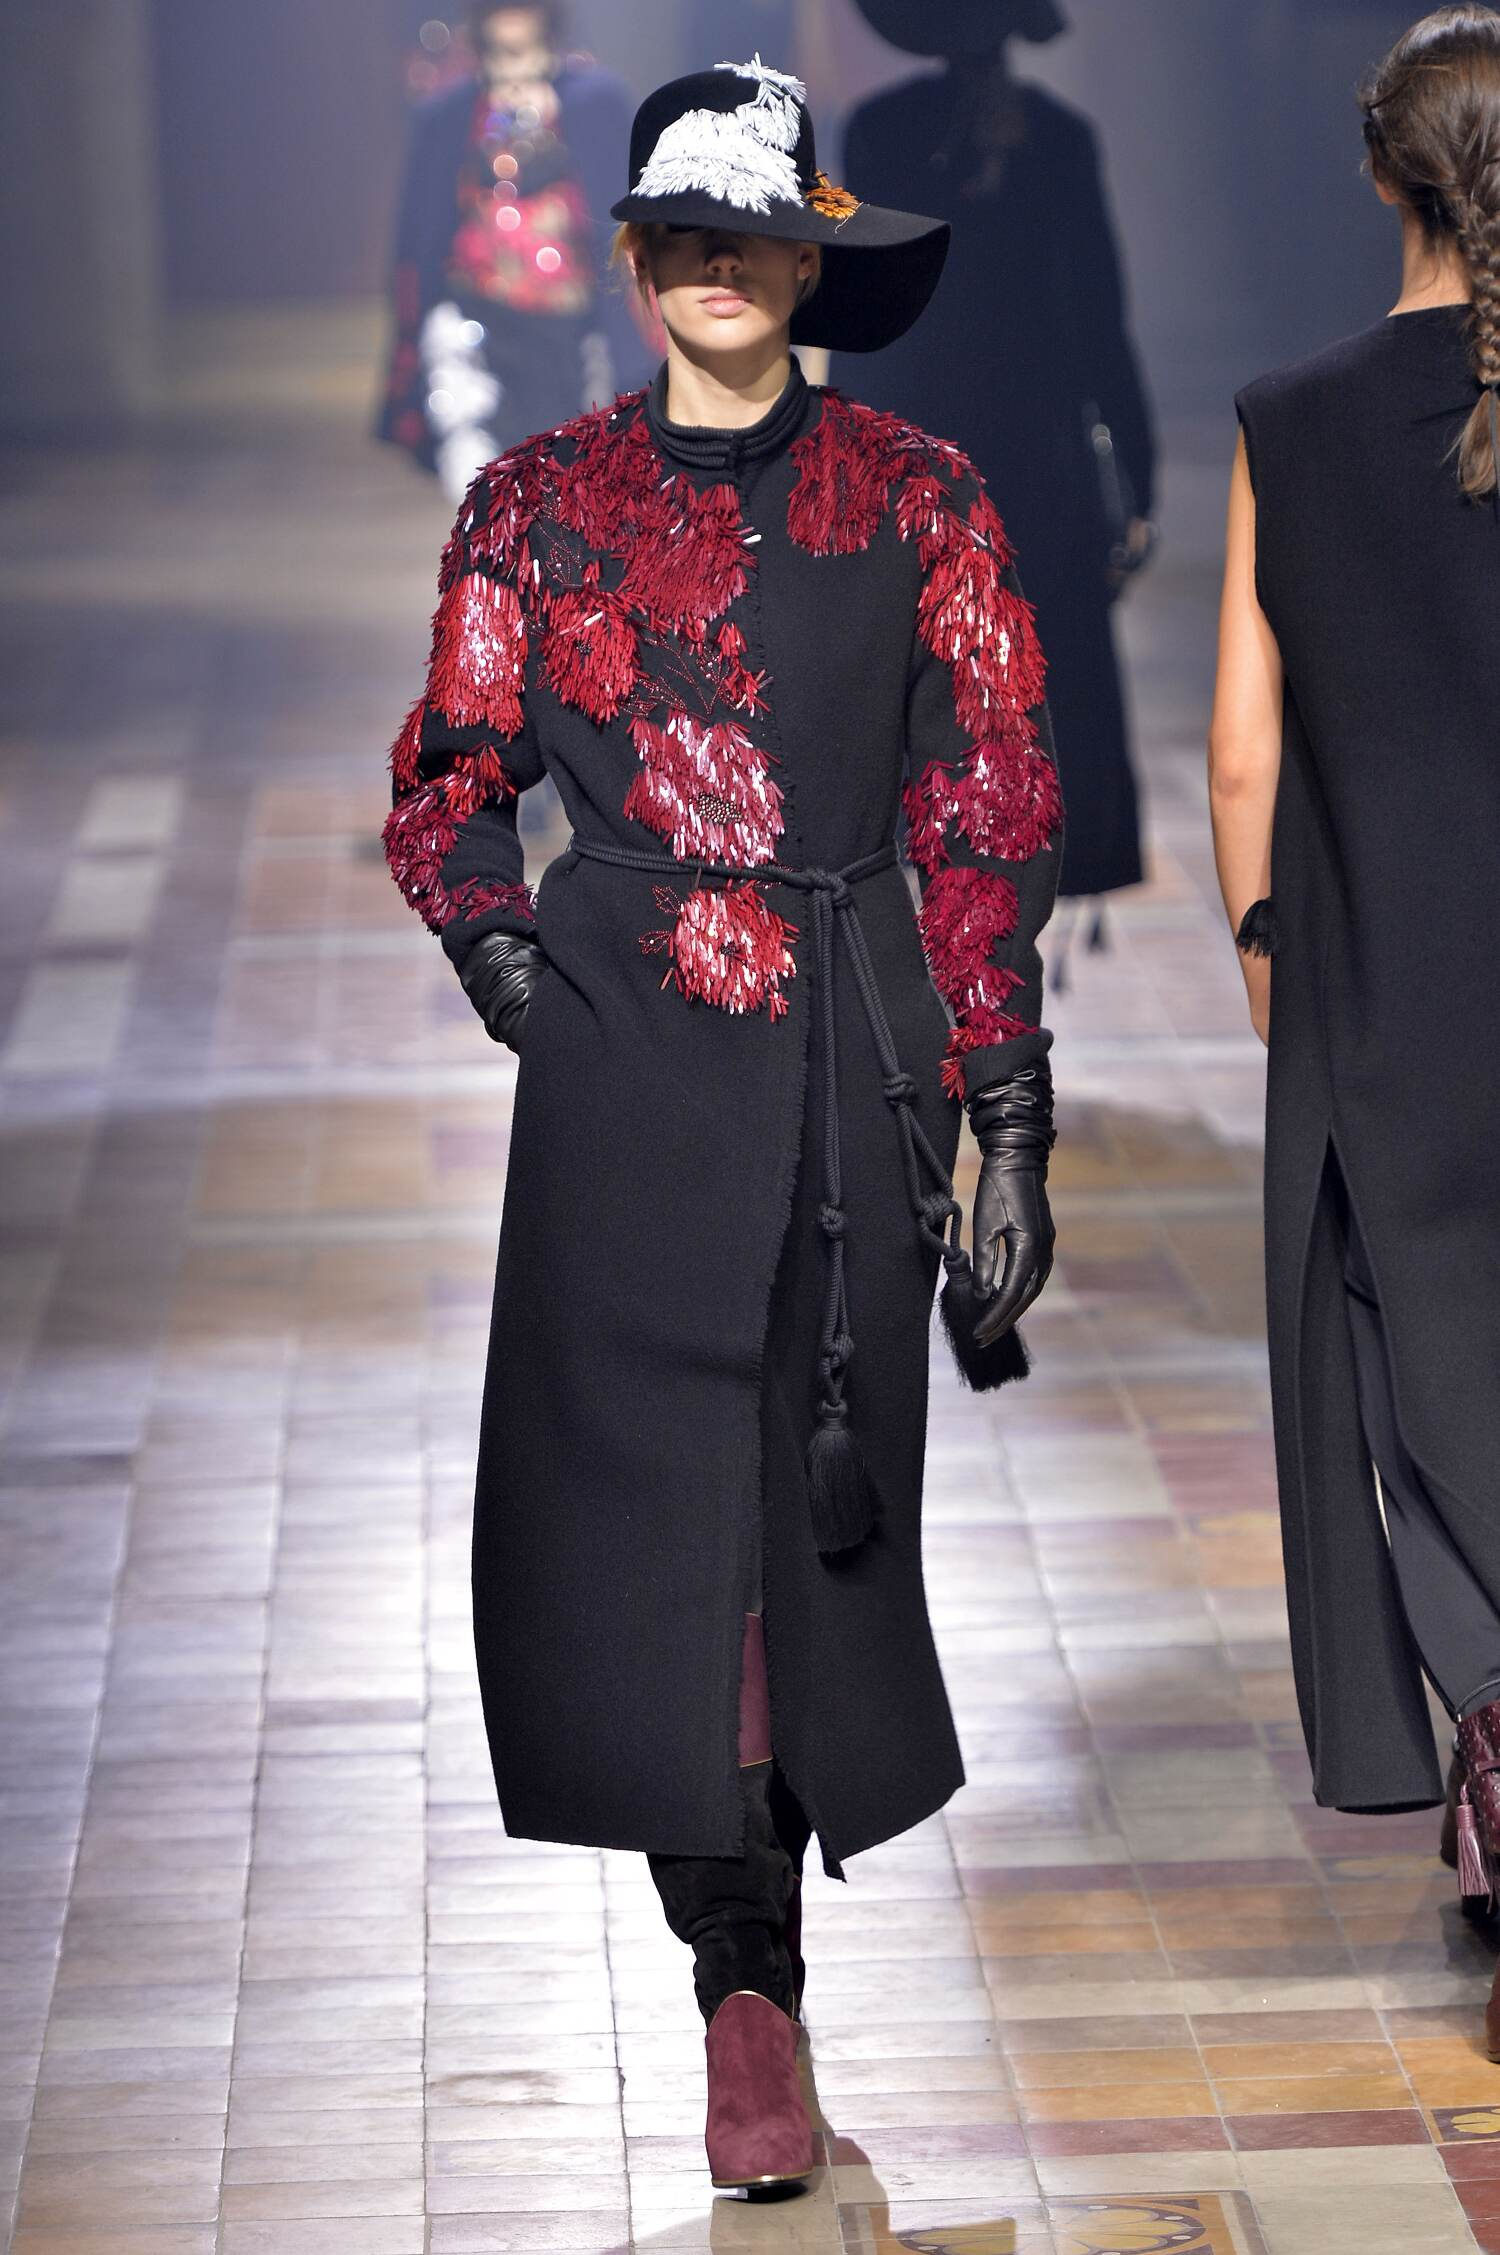 2015 Fall Fashion Woman Lanvin Collection